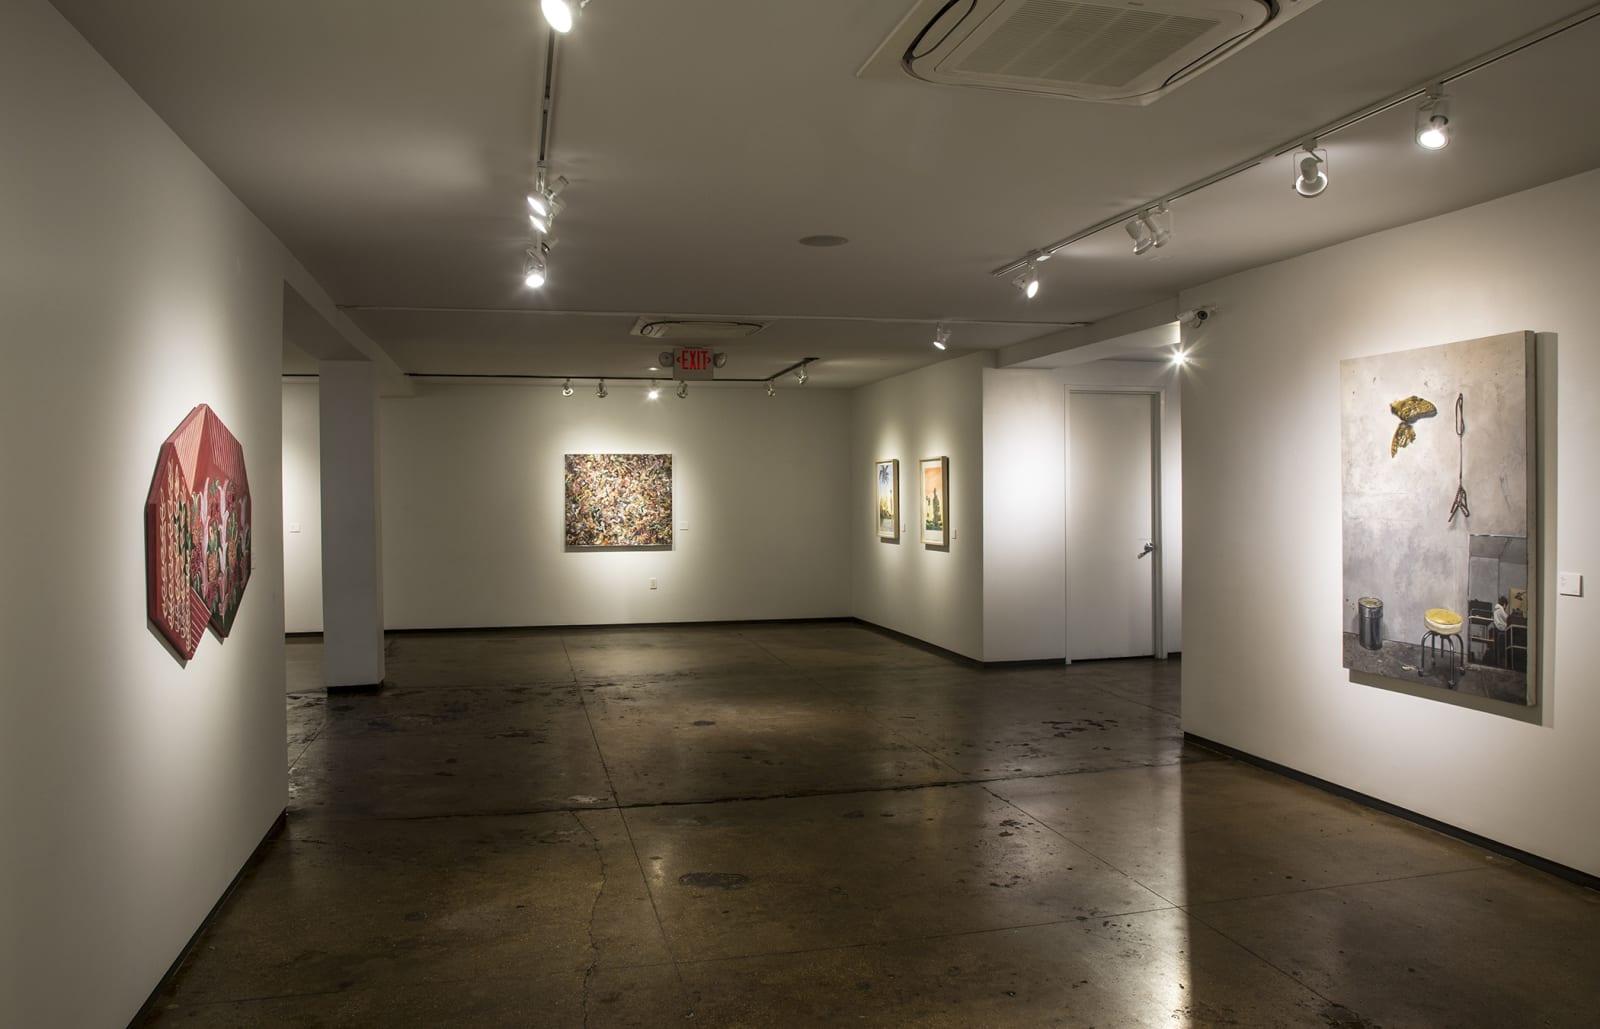 Studio111: Collective Inspiration